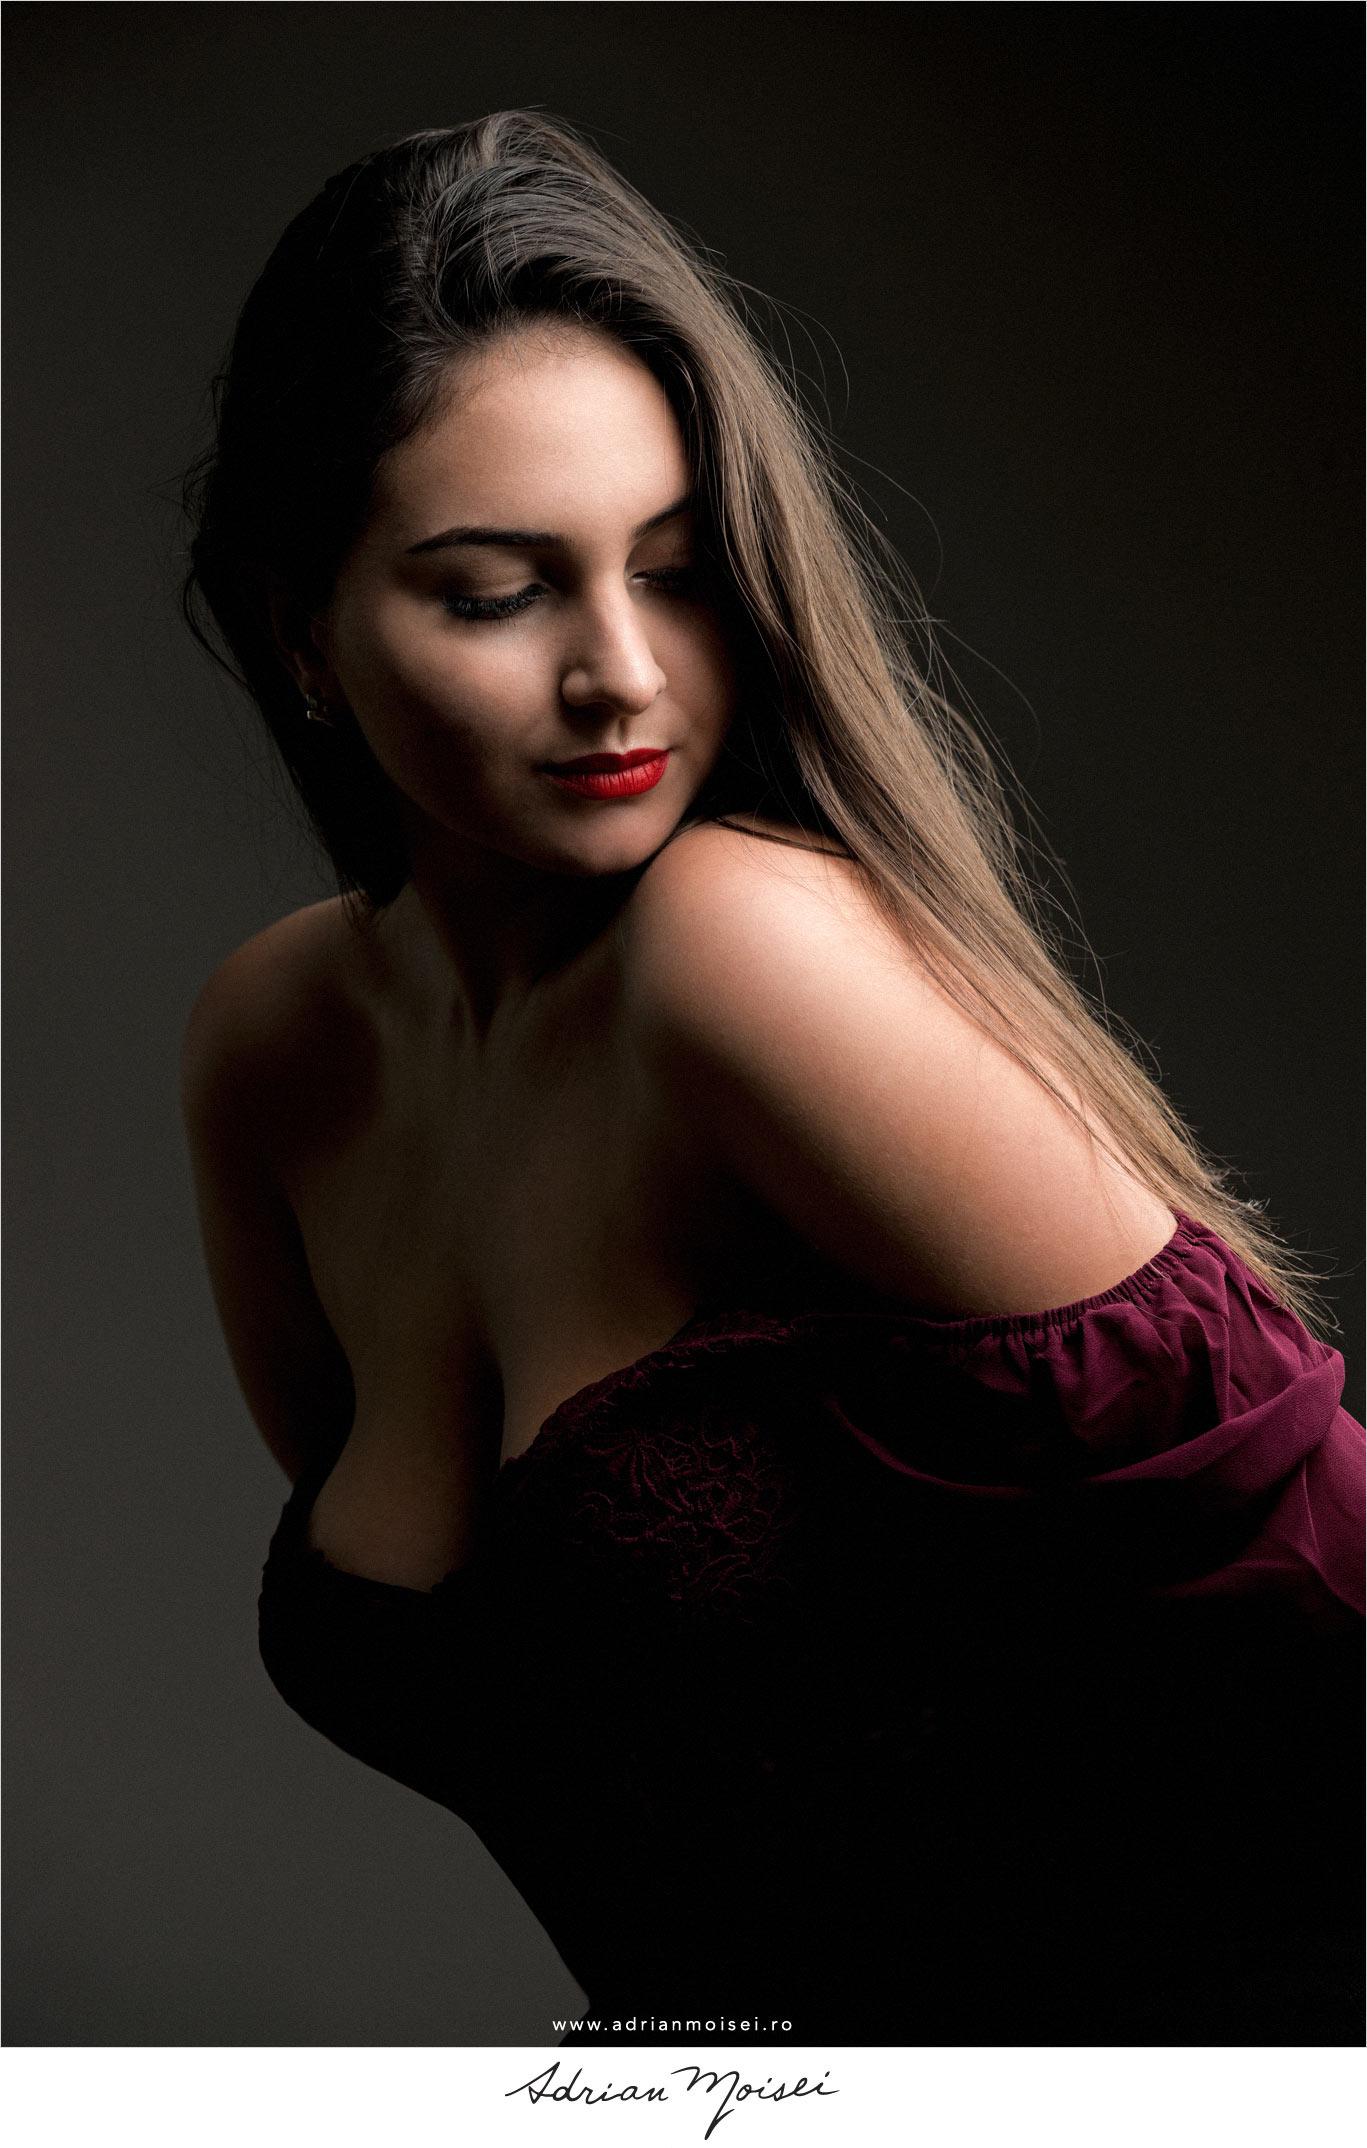 Fotograf fashion Iasi, fashion photographer Bucharest, Adrian Moisei, fine-art photography